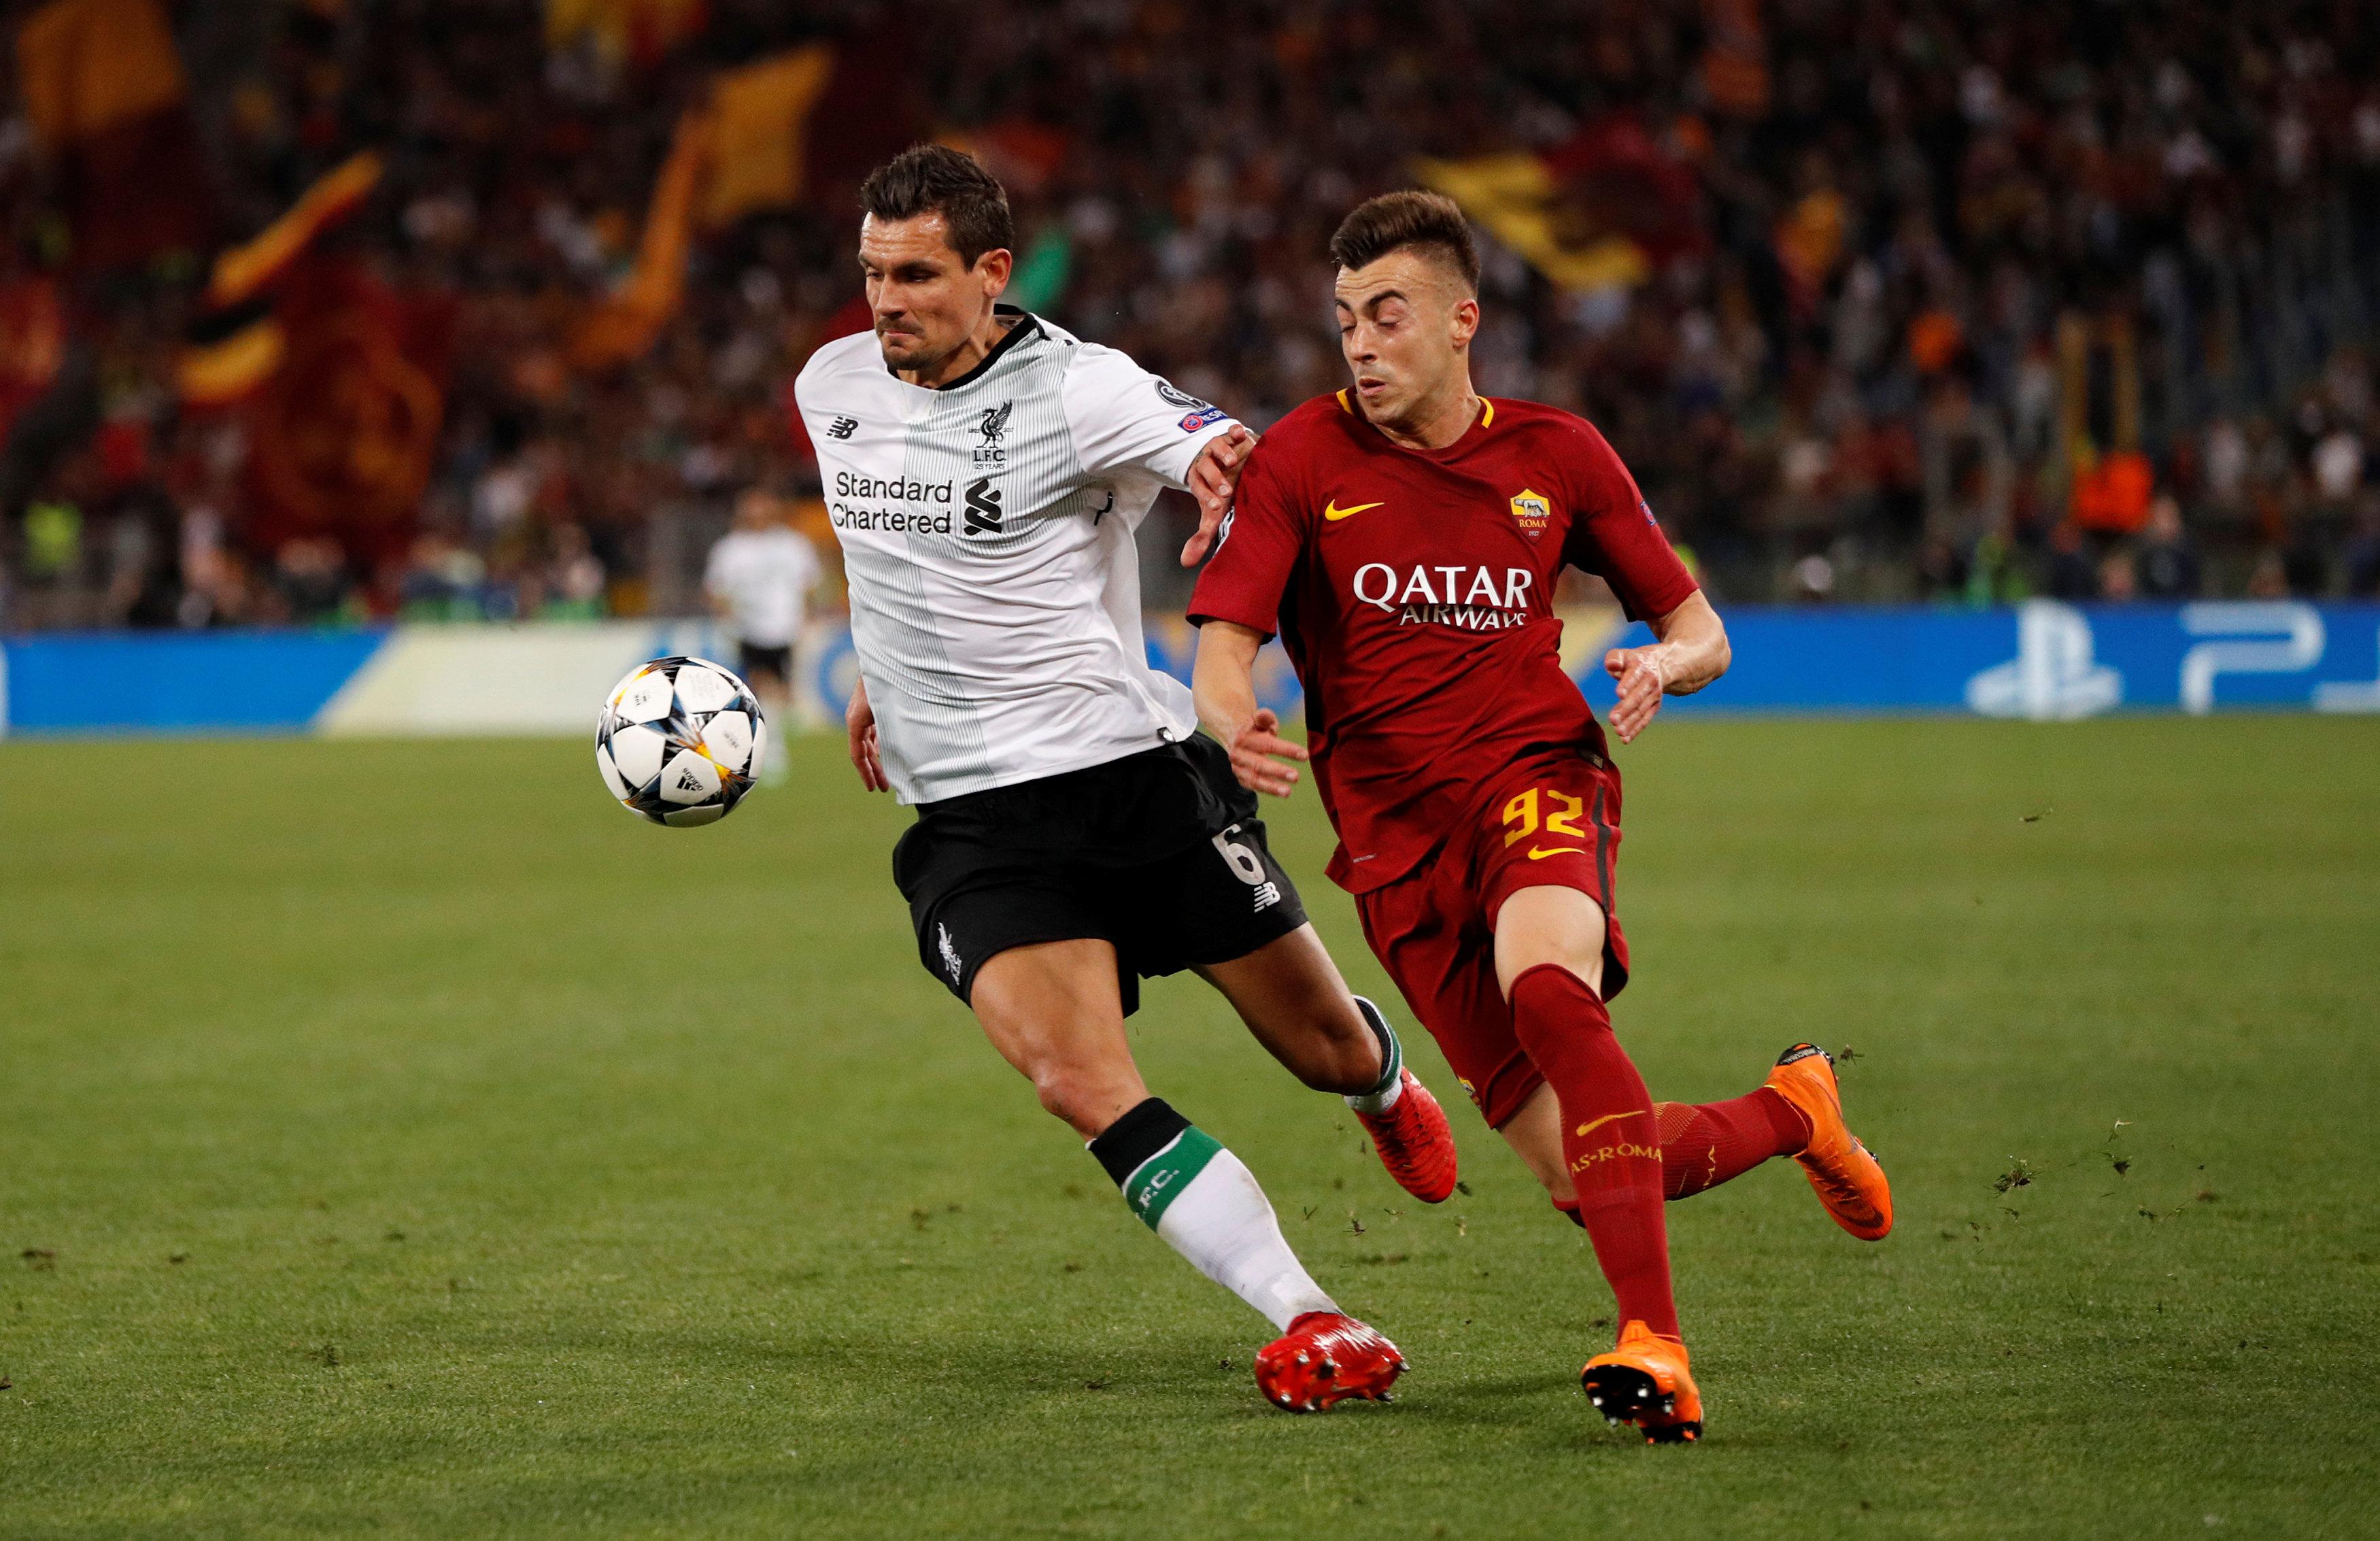 Dejan Lovren pretprošle je sezone u dresu Liverpoola igrao protiv Rome polufinale Lige prvaka